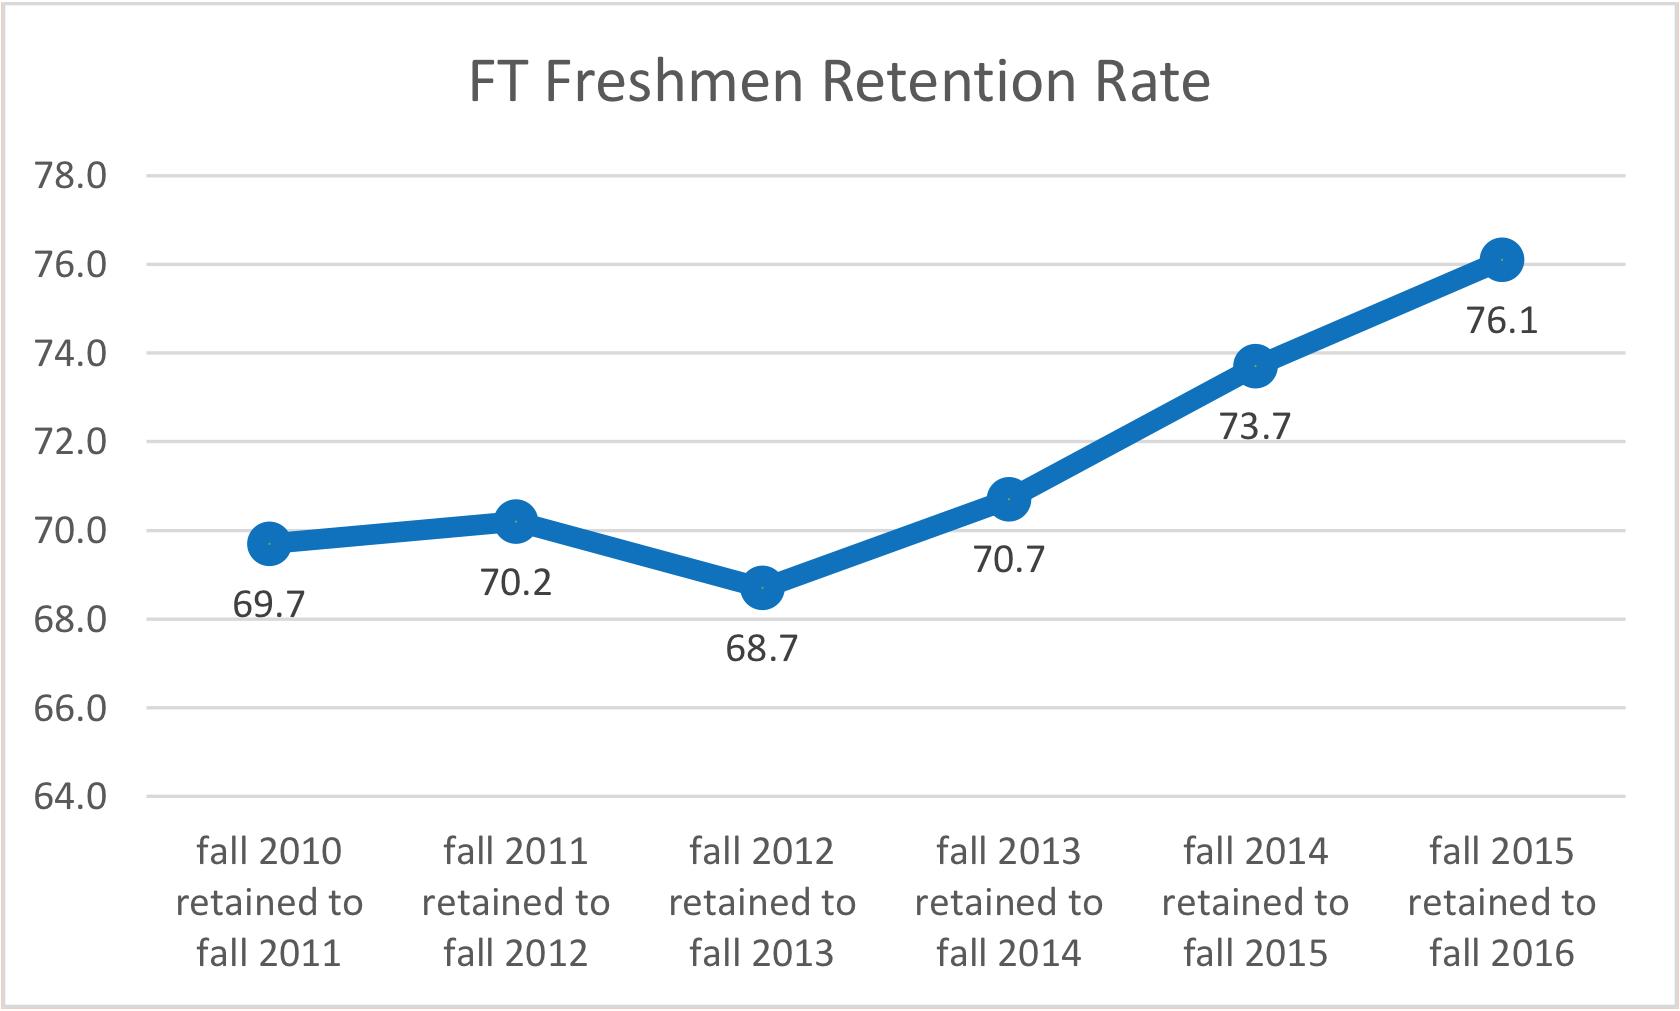 Figure 1, MTSU full-time freshmen retention rates: fall 2011 to fall 2016